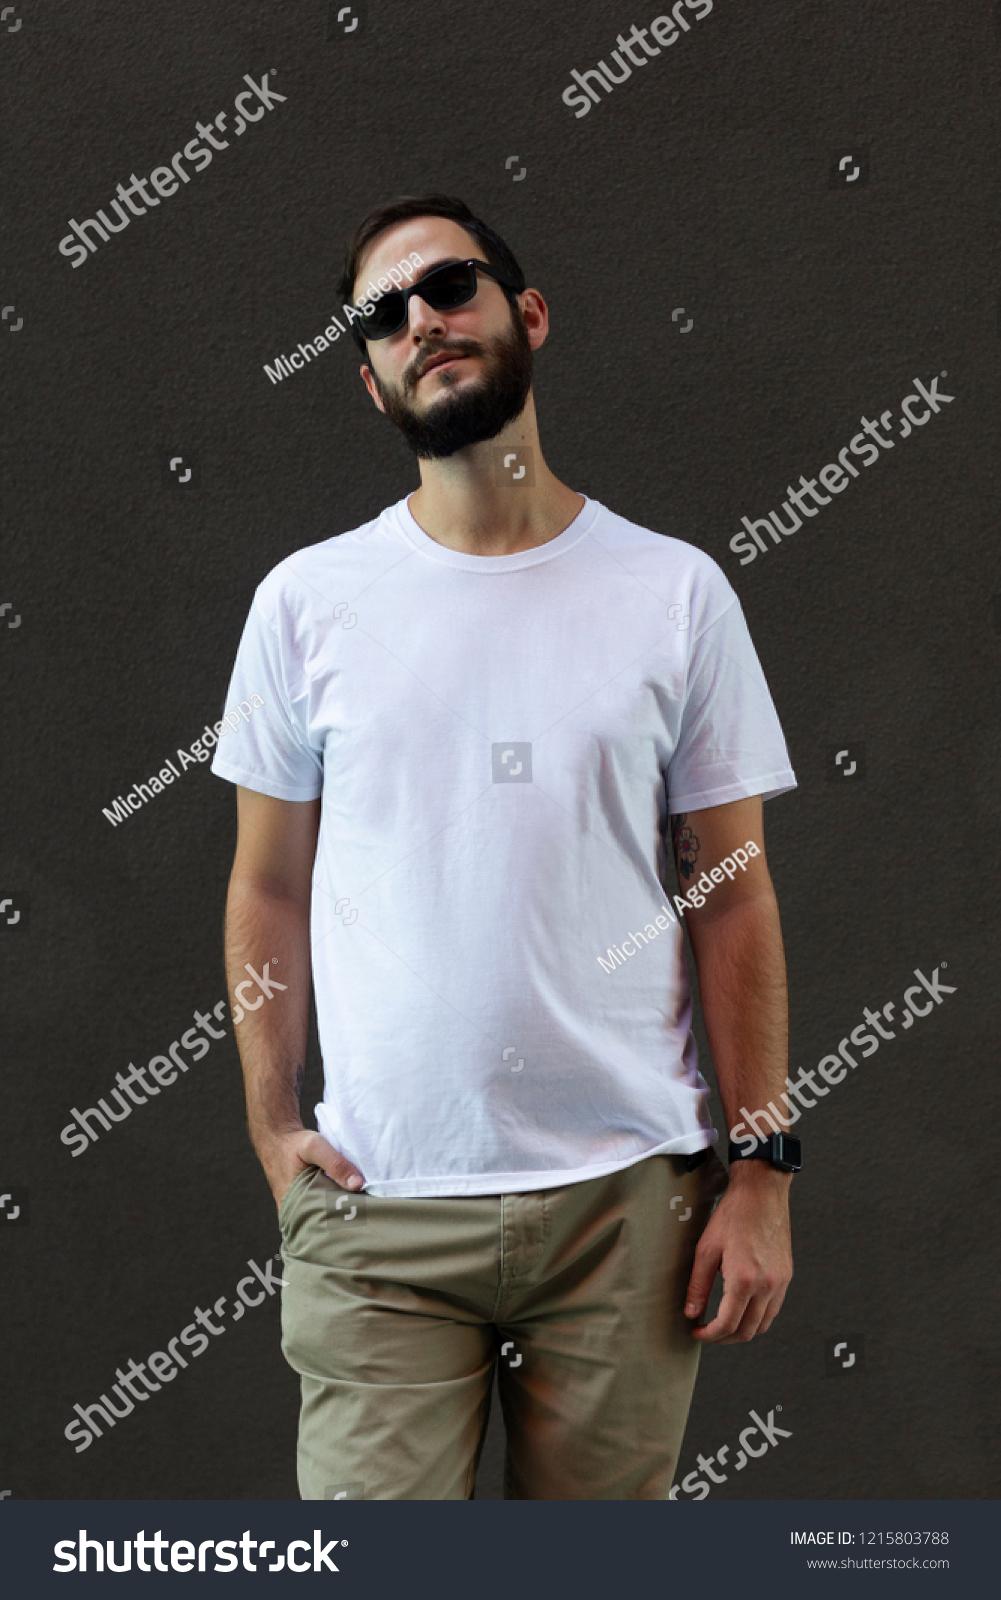 Male Model Wearing White Tshirt Mockup Stock Photo Edit Now